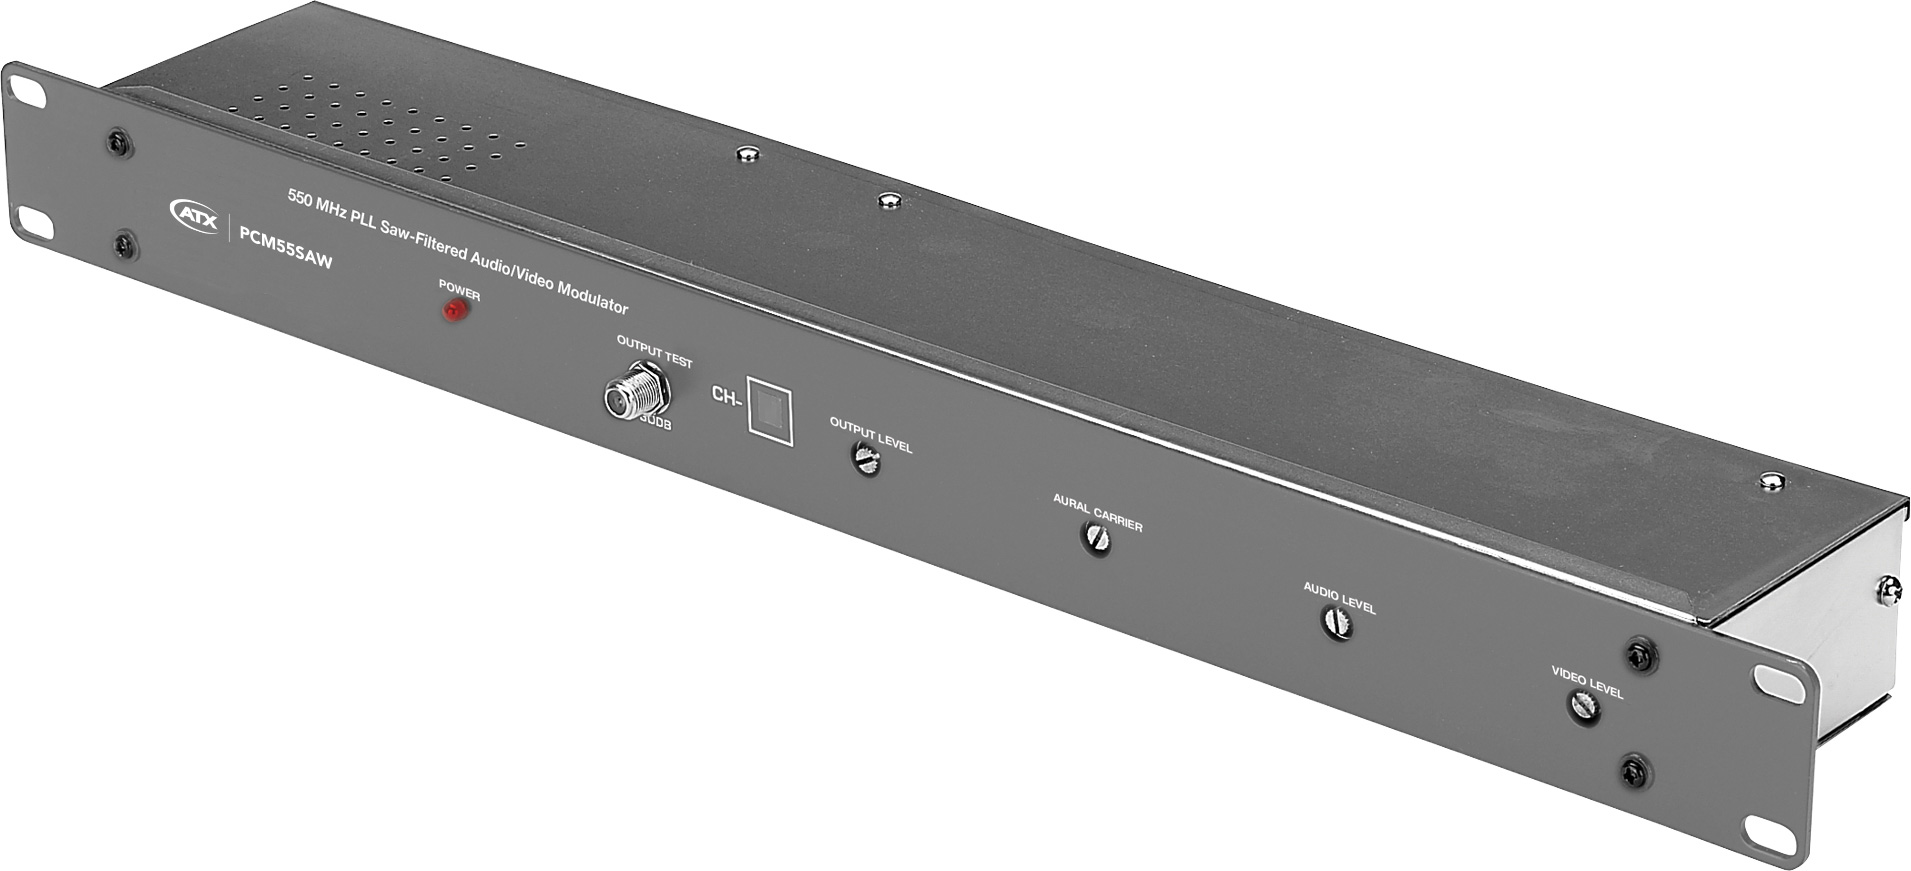 1 Channel Crystal A/V Modulator - Channel 17 PM-PCM55SAW-17